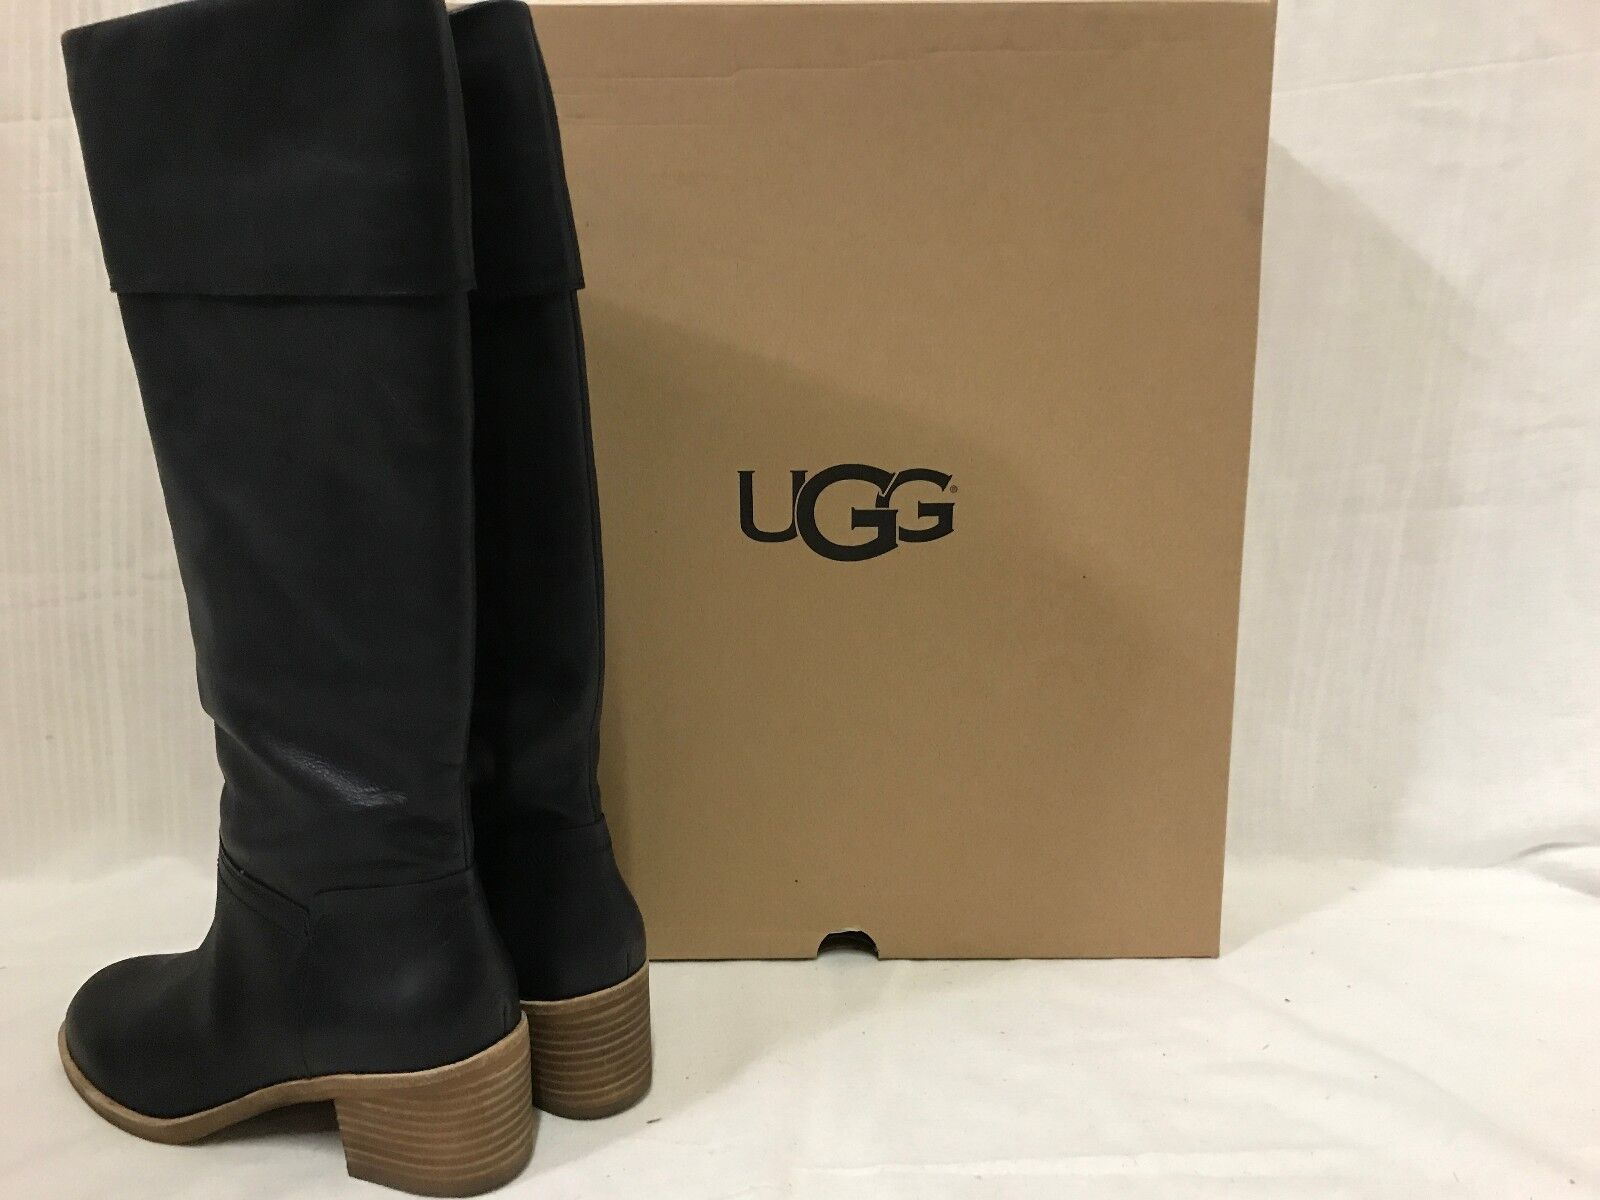 78129b51c661 UGG Women s Carlin Block Heel Tall BOOTS Size 10   D4 12 Blemish for sale  online